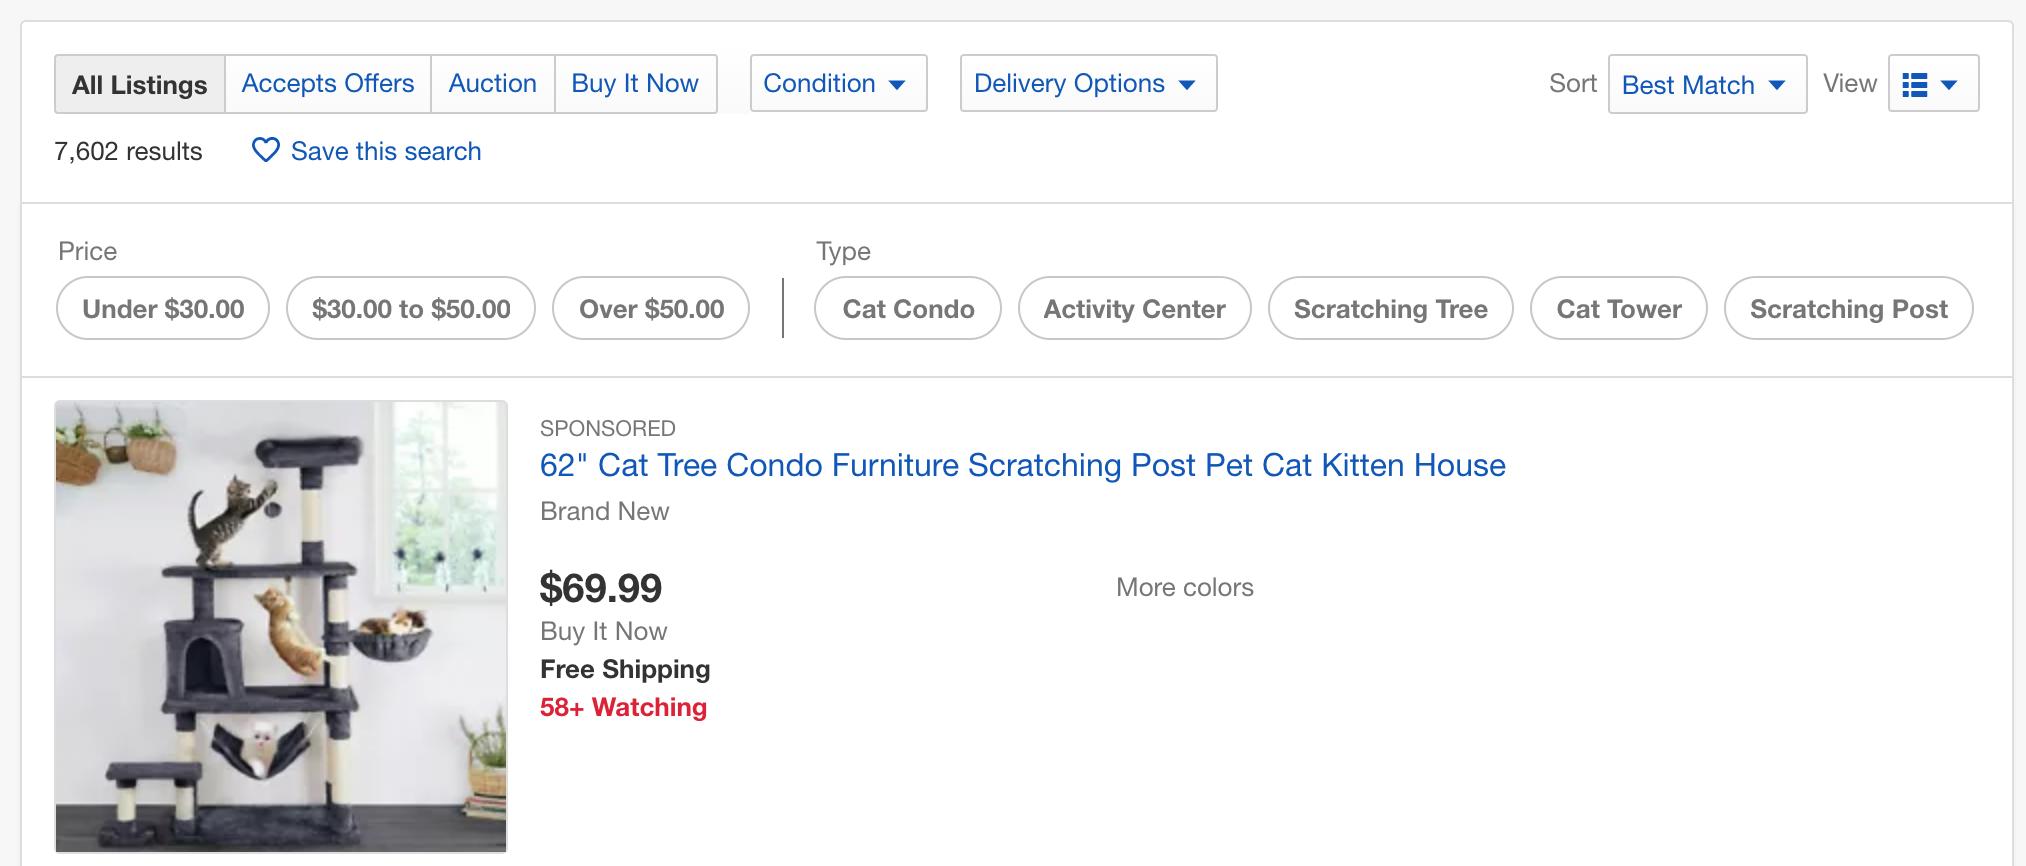 promoted listing on ebay